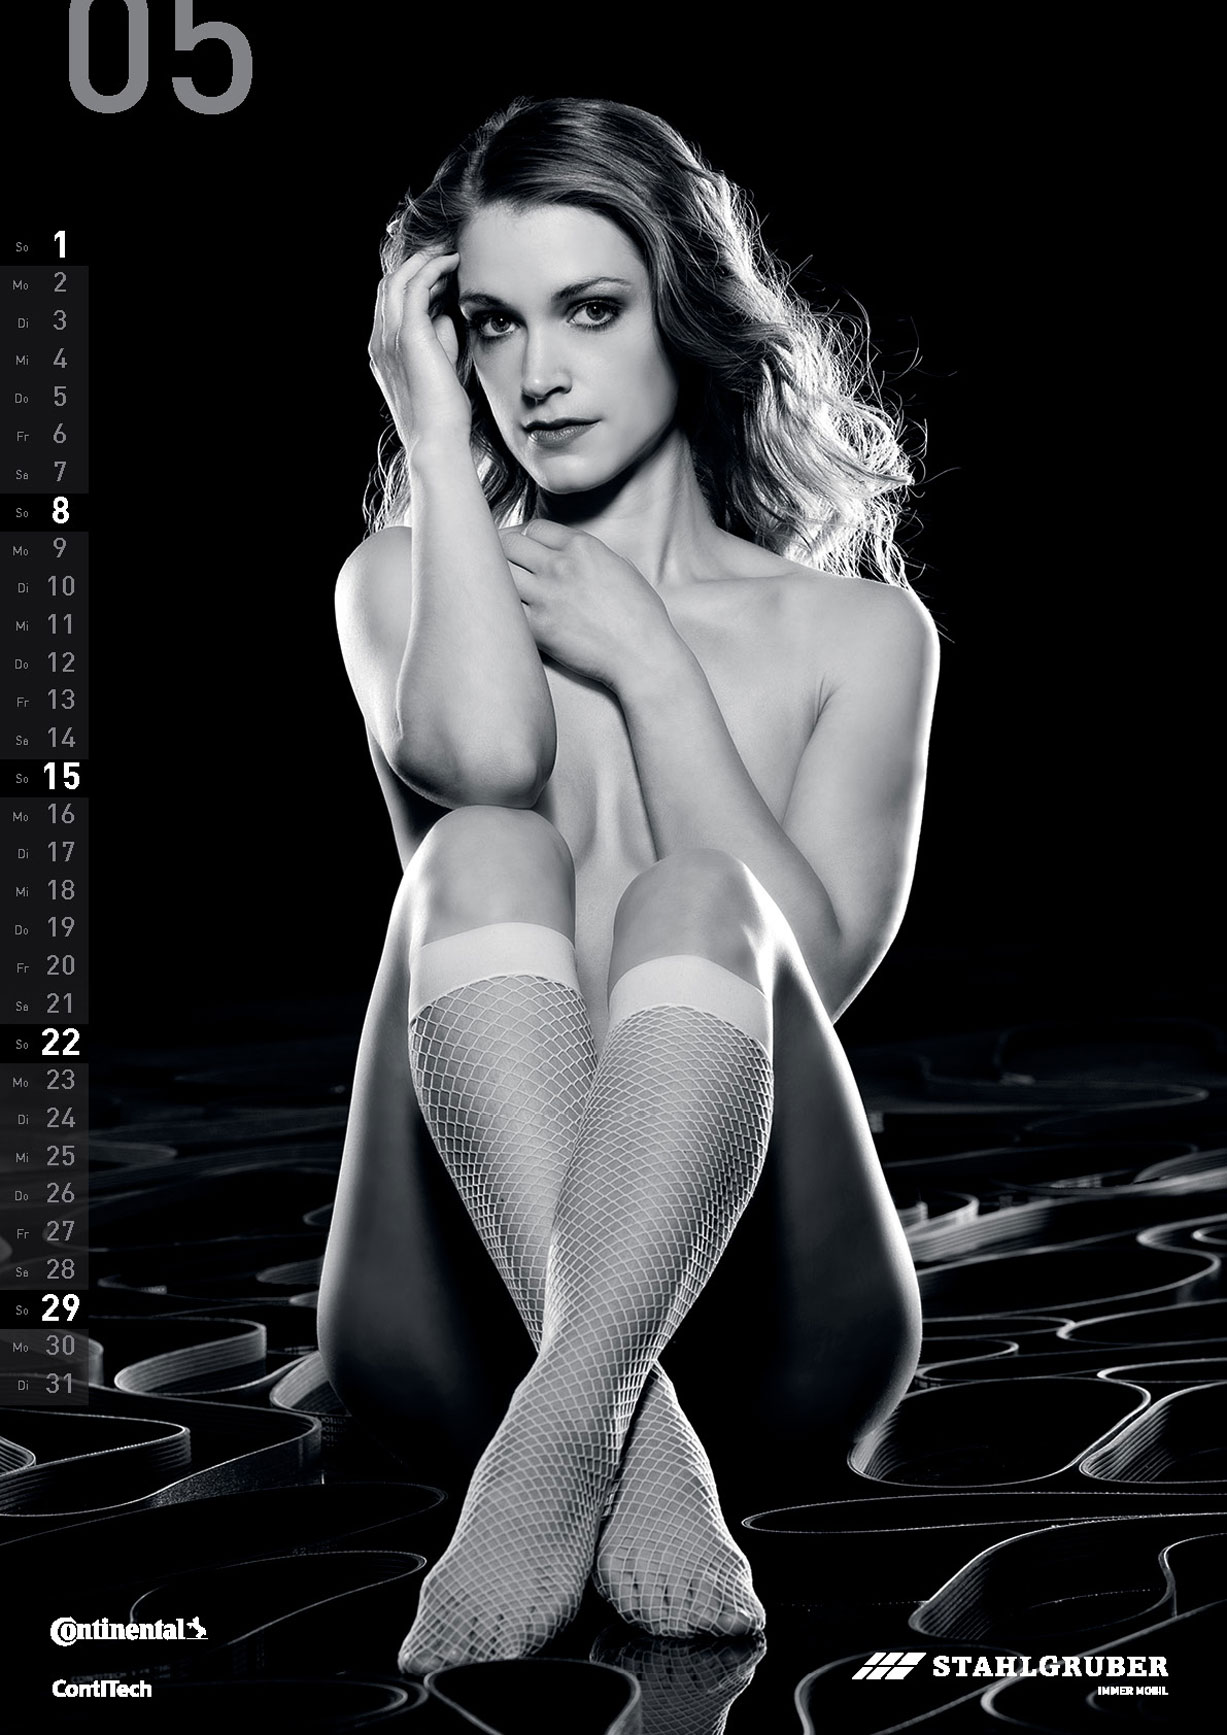 Черно-белый эротический календарь 2016 WERKSTATTkultur